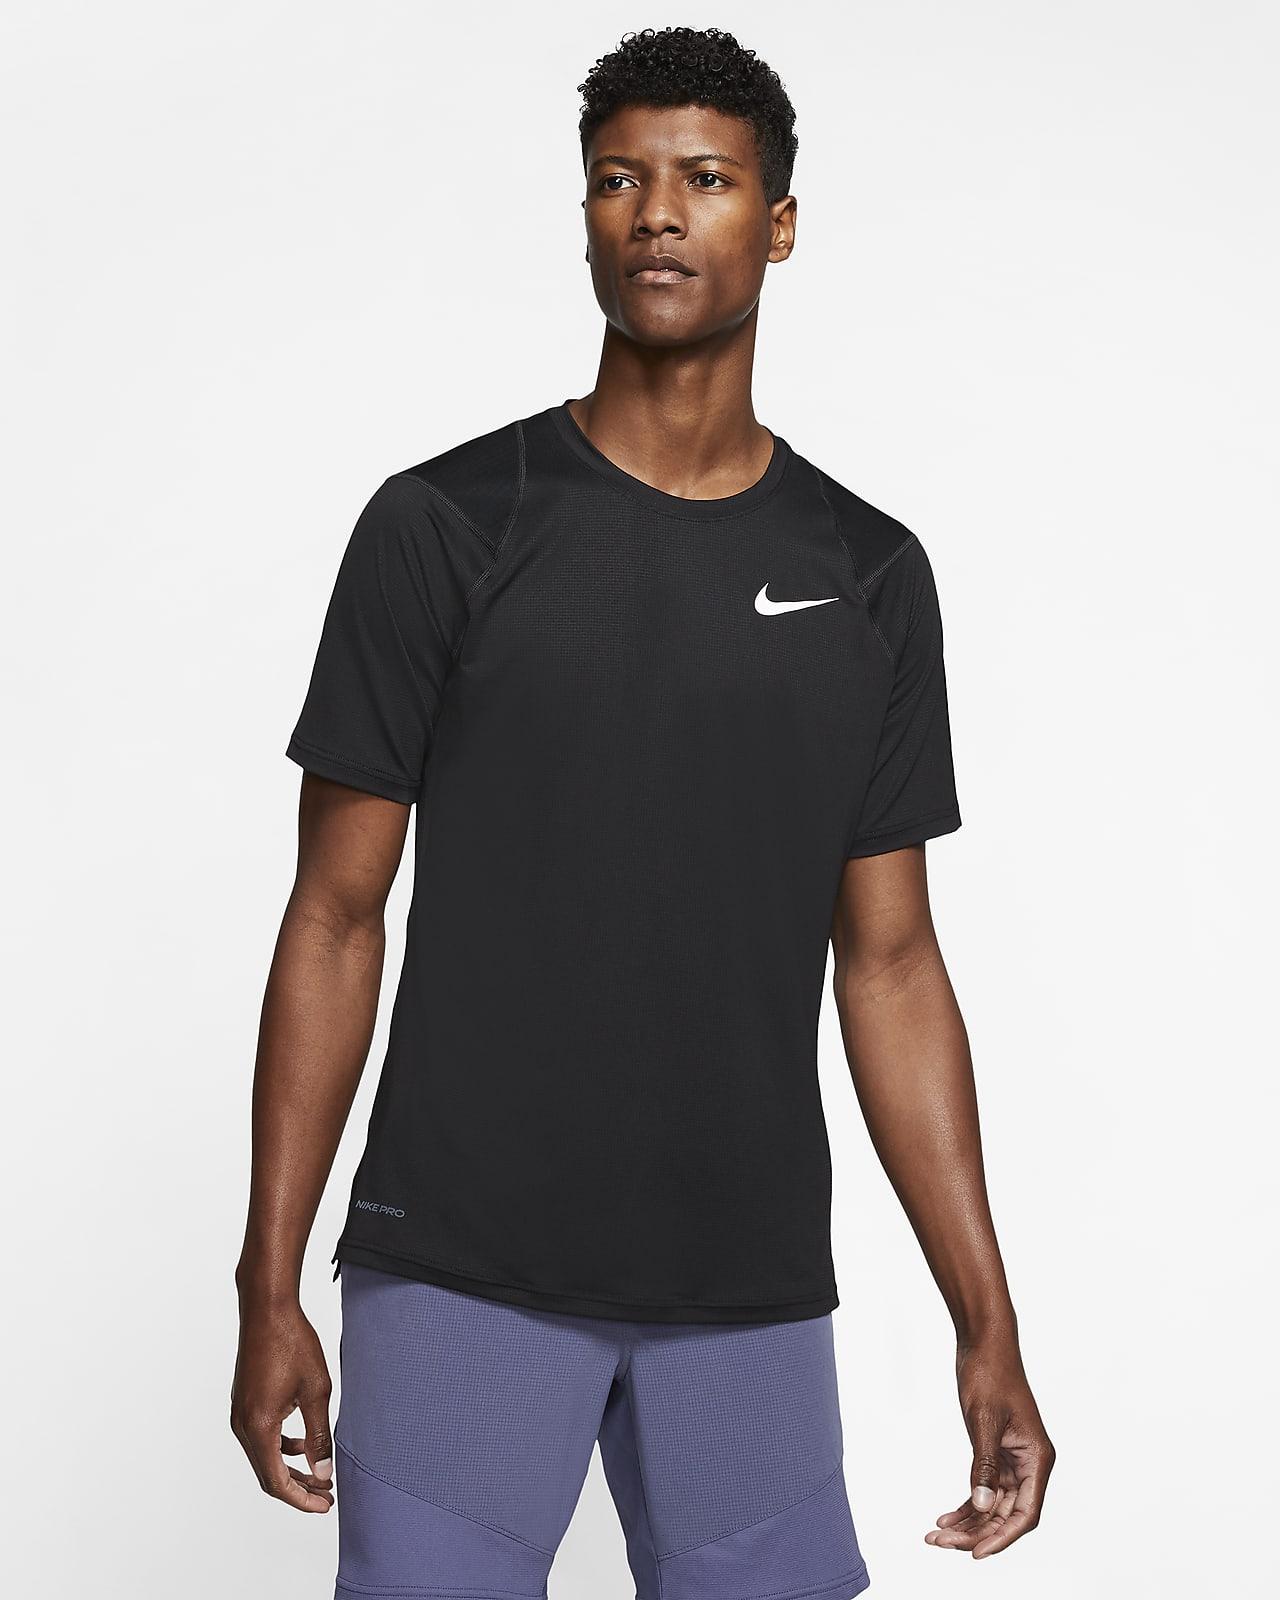 Camisola de manga curta Nike Pro para homem